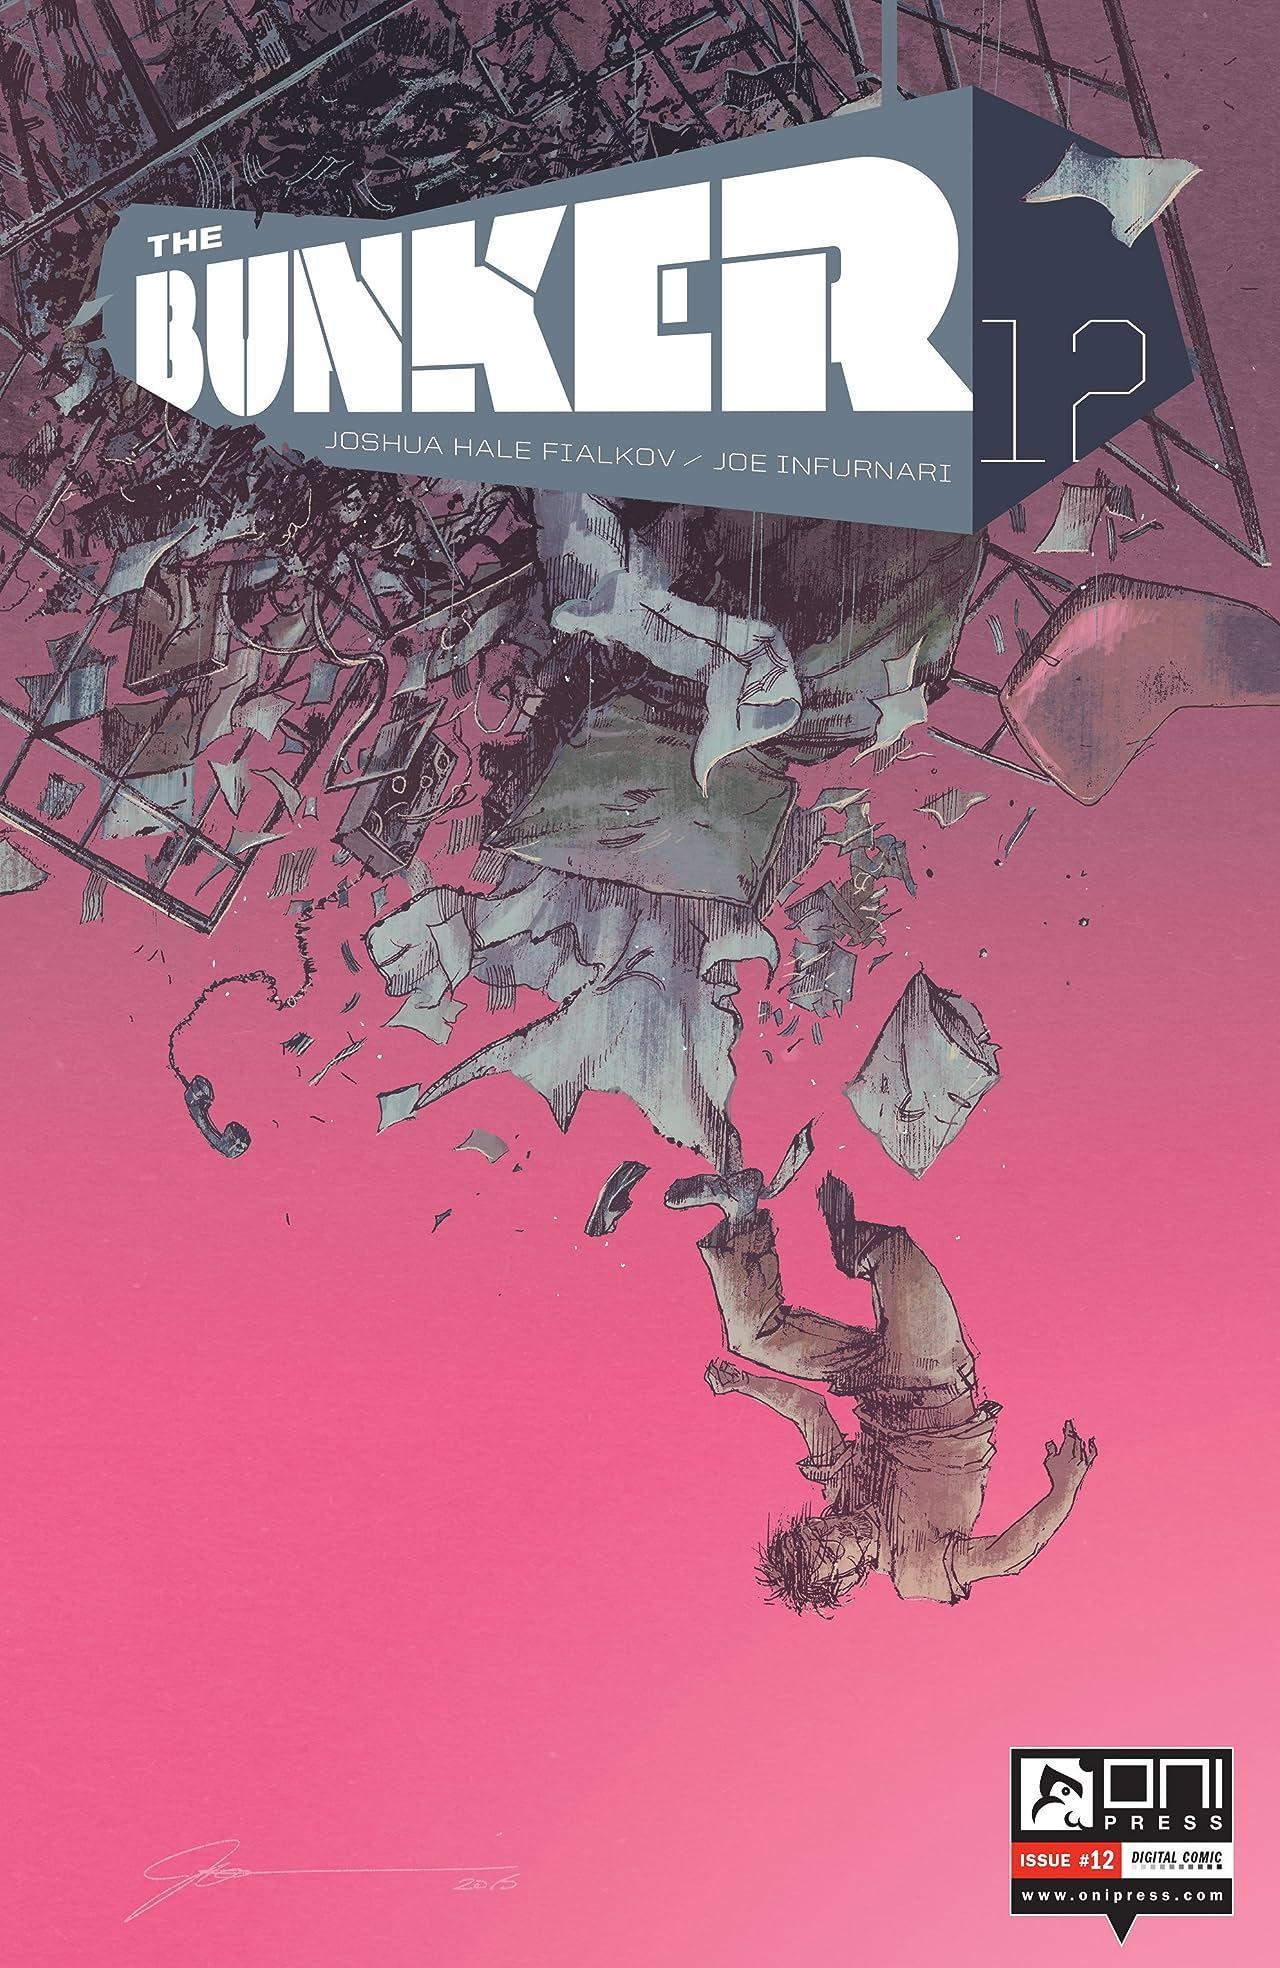 The Bunker #12